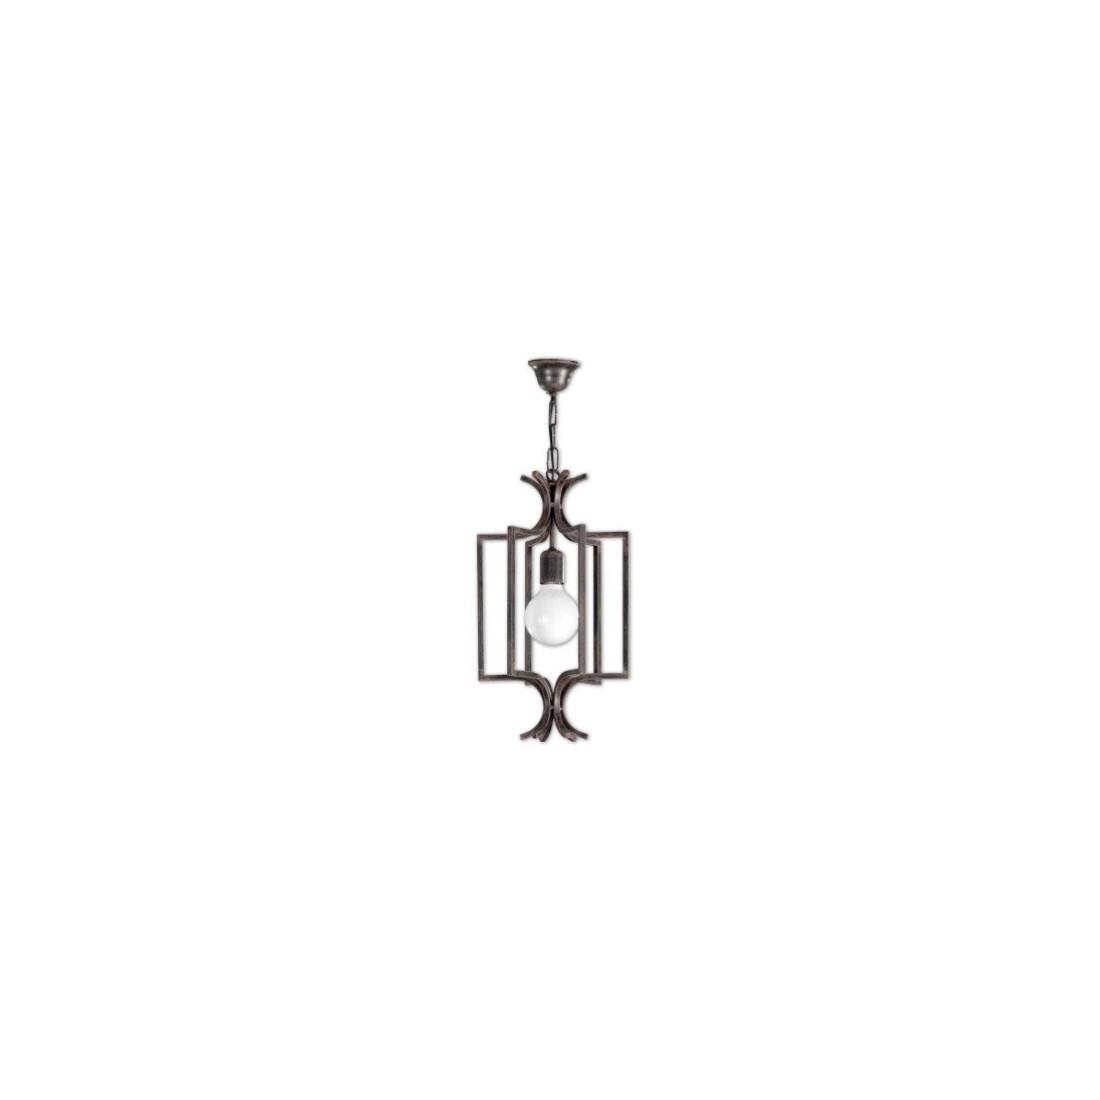 Apliques exterior apliques exterior online comprar for Luces exterior bombillas